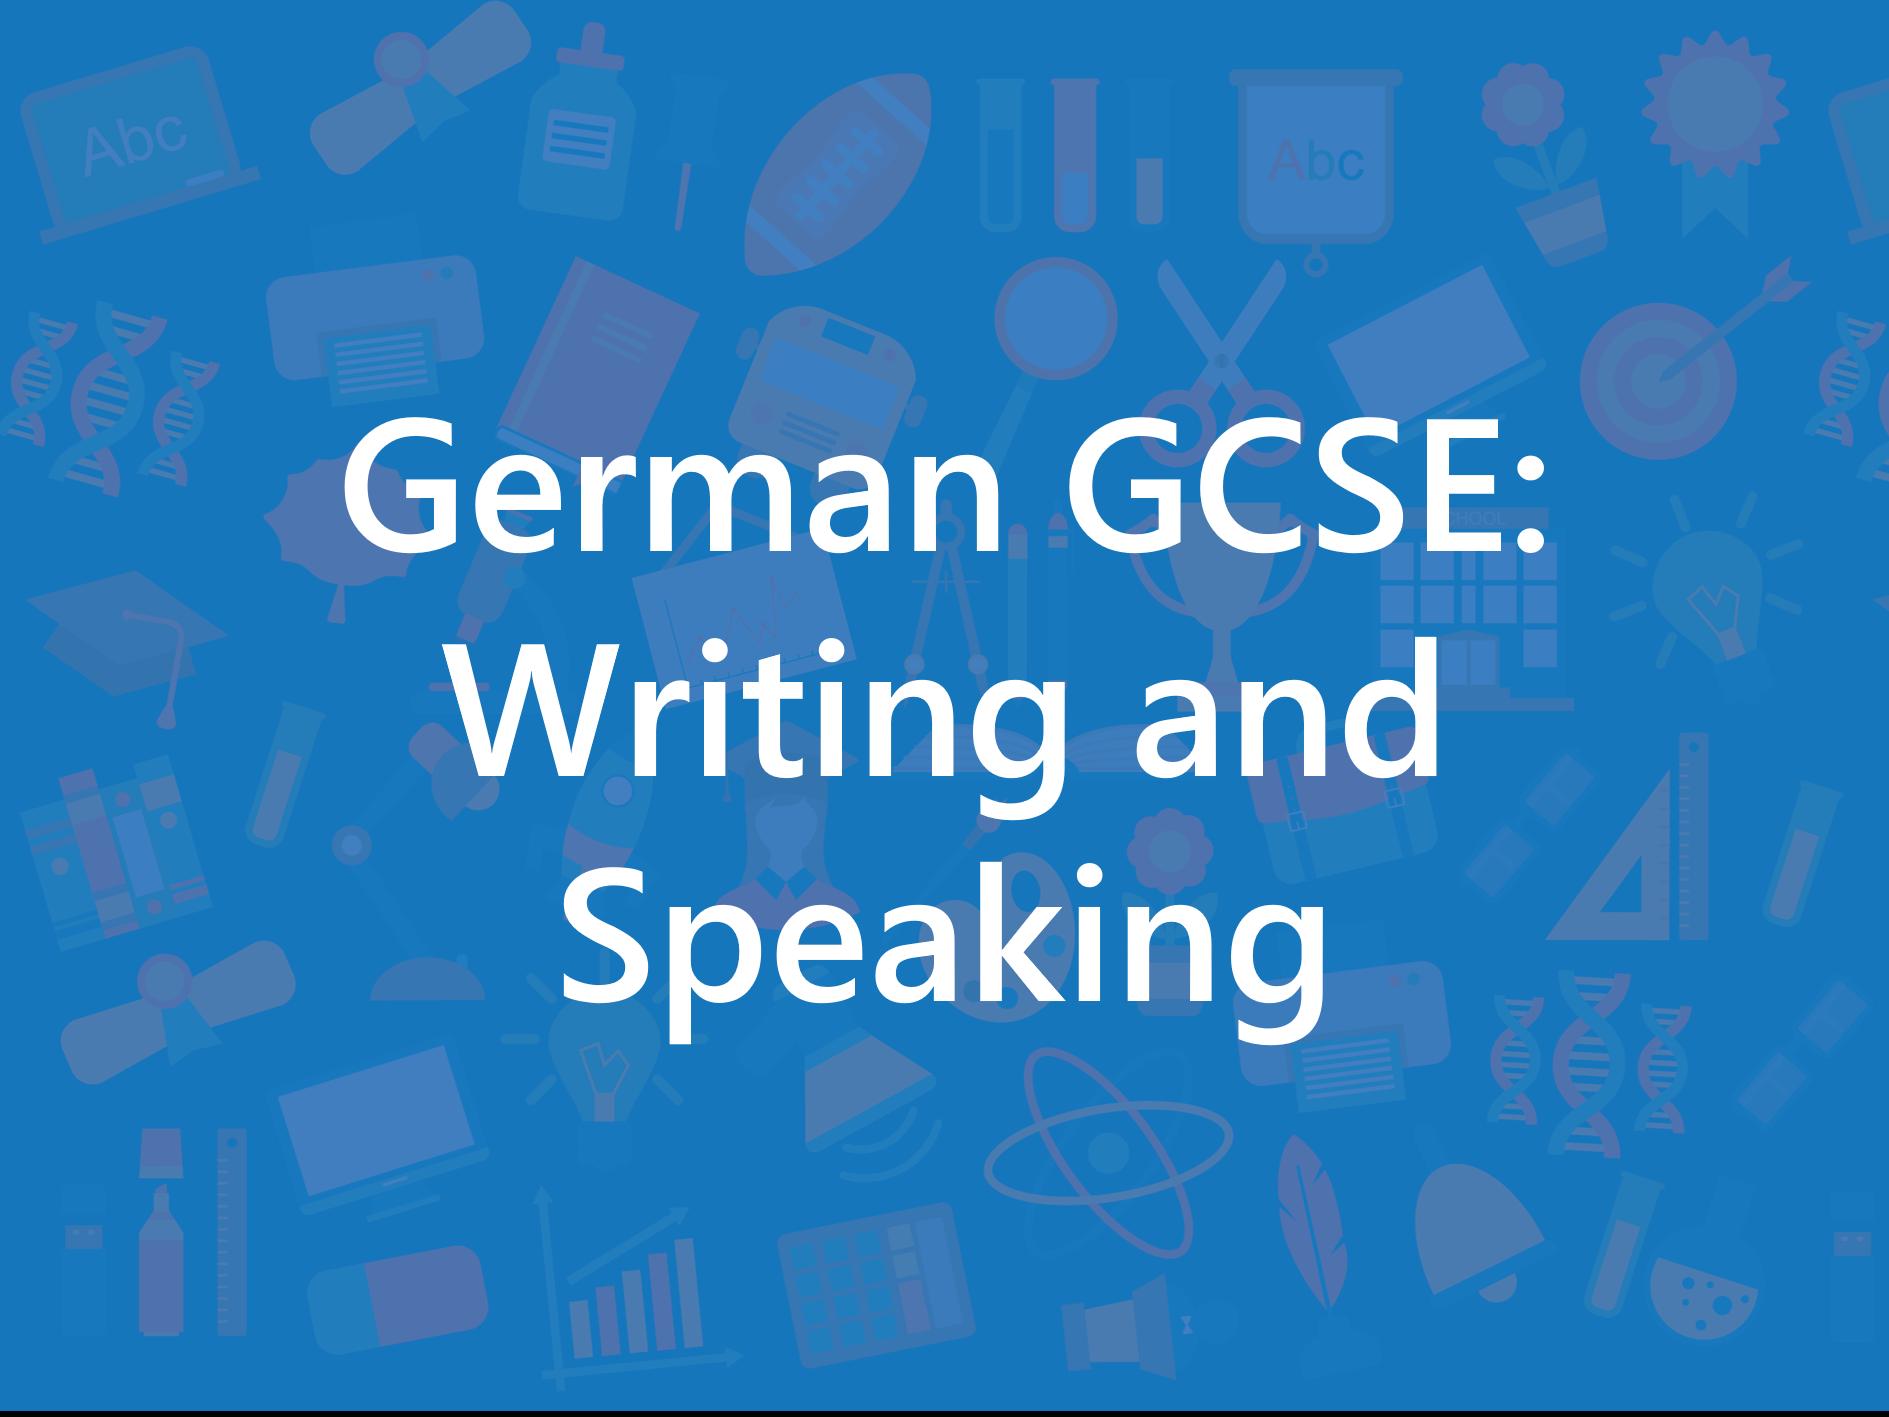 German GCSE: Writing and Speaking